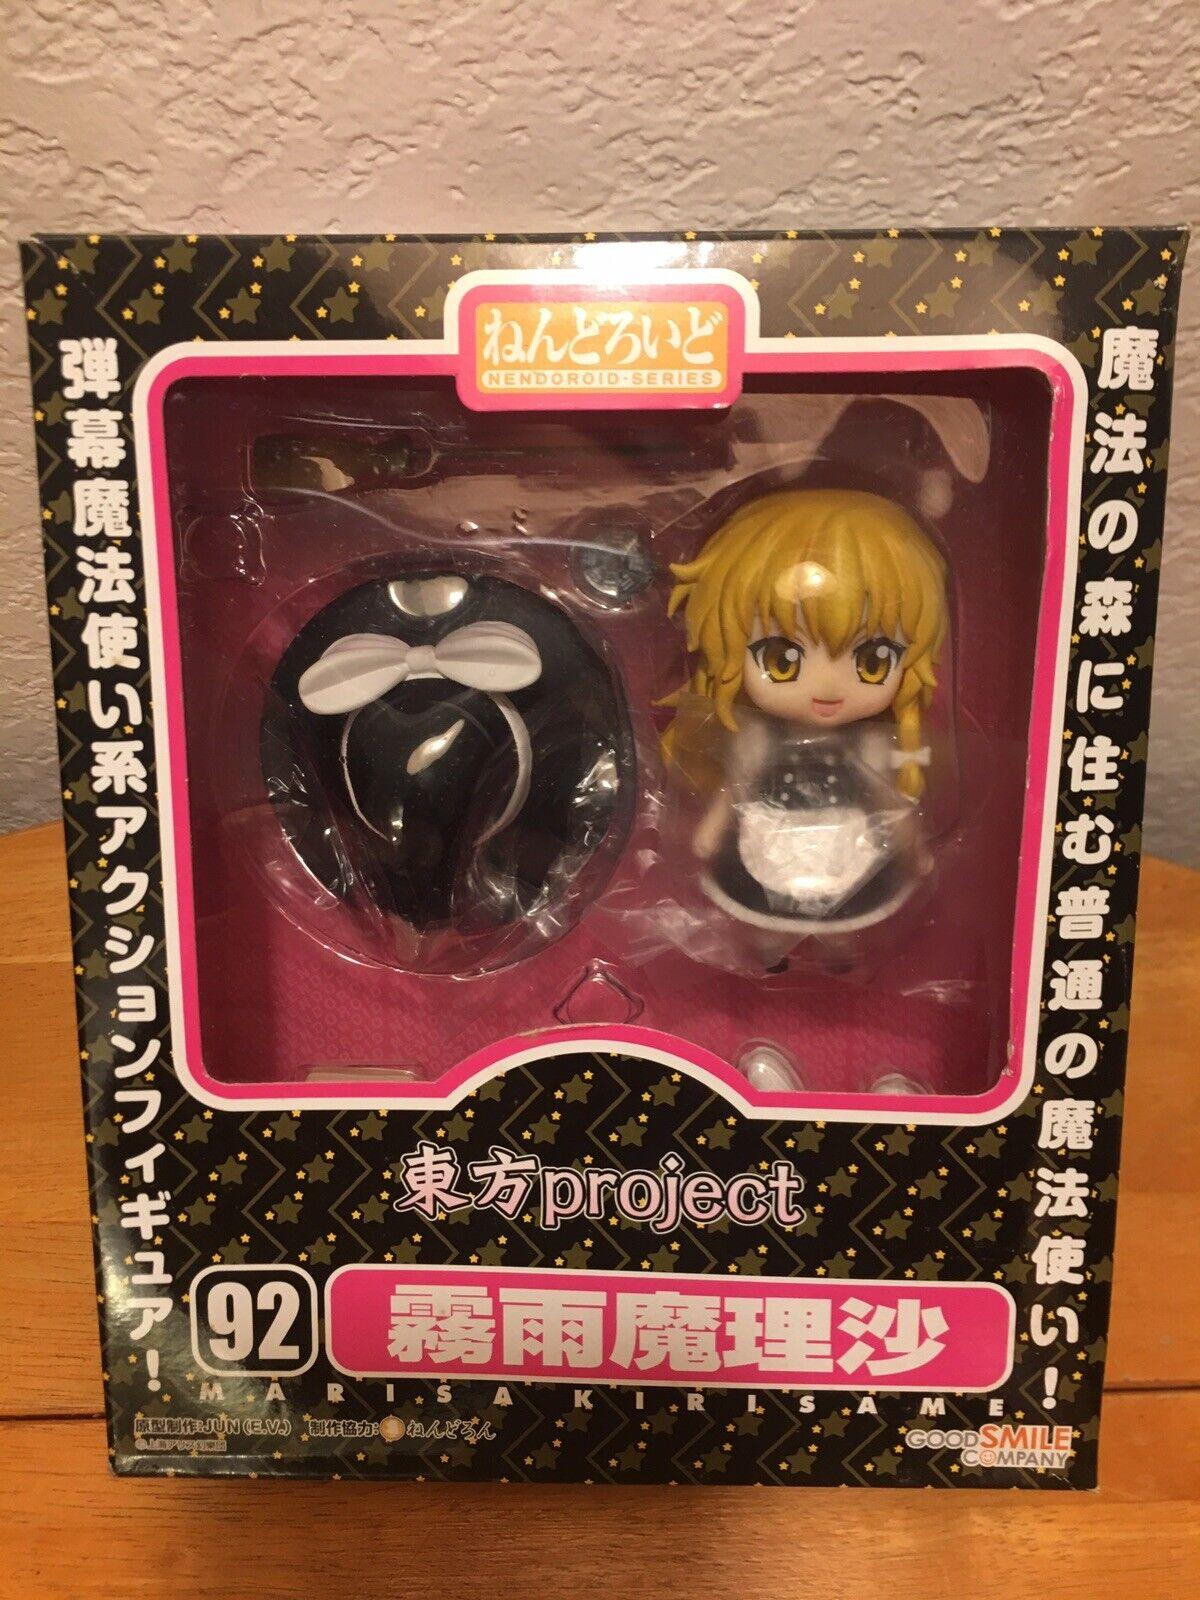 Touhou project figure Nendoroid Marisa Kirisame Painted Figure Japan Good Smile